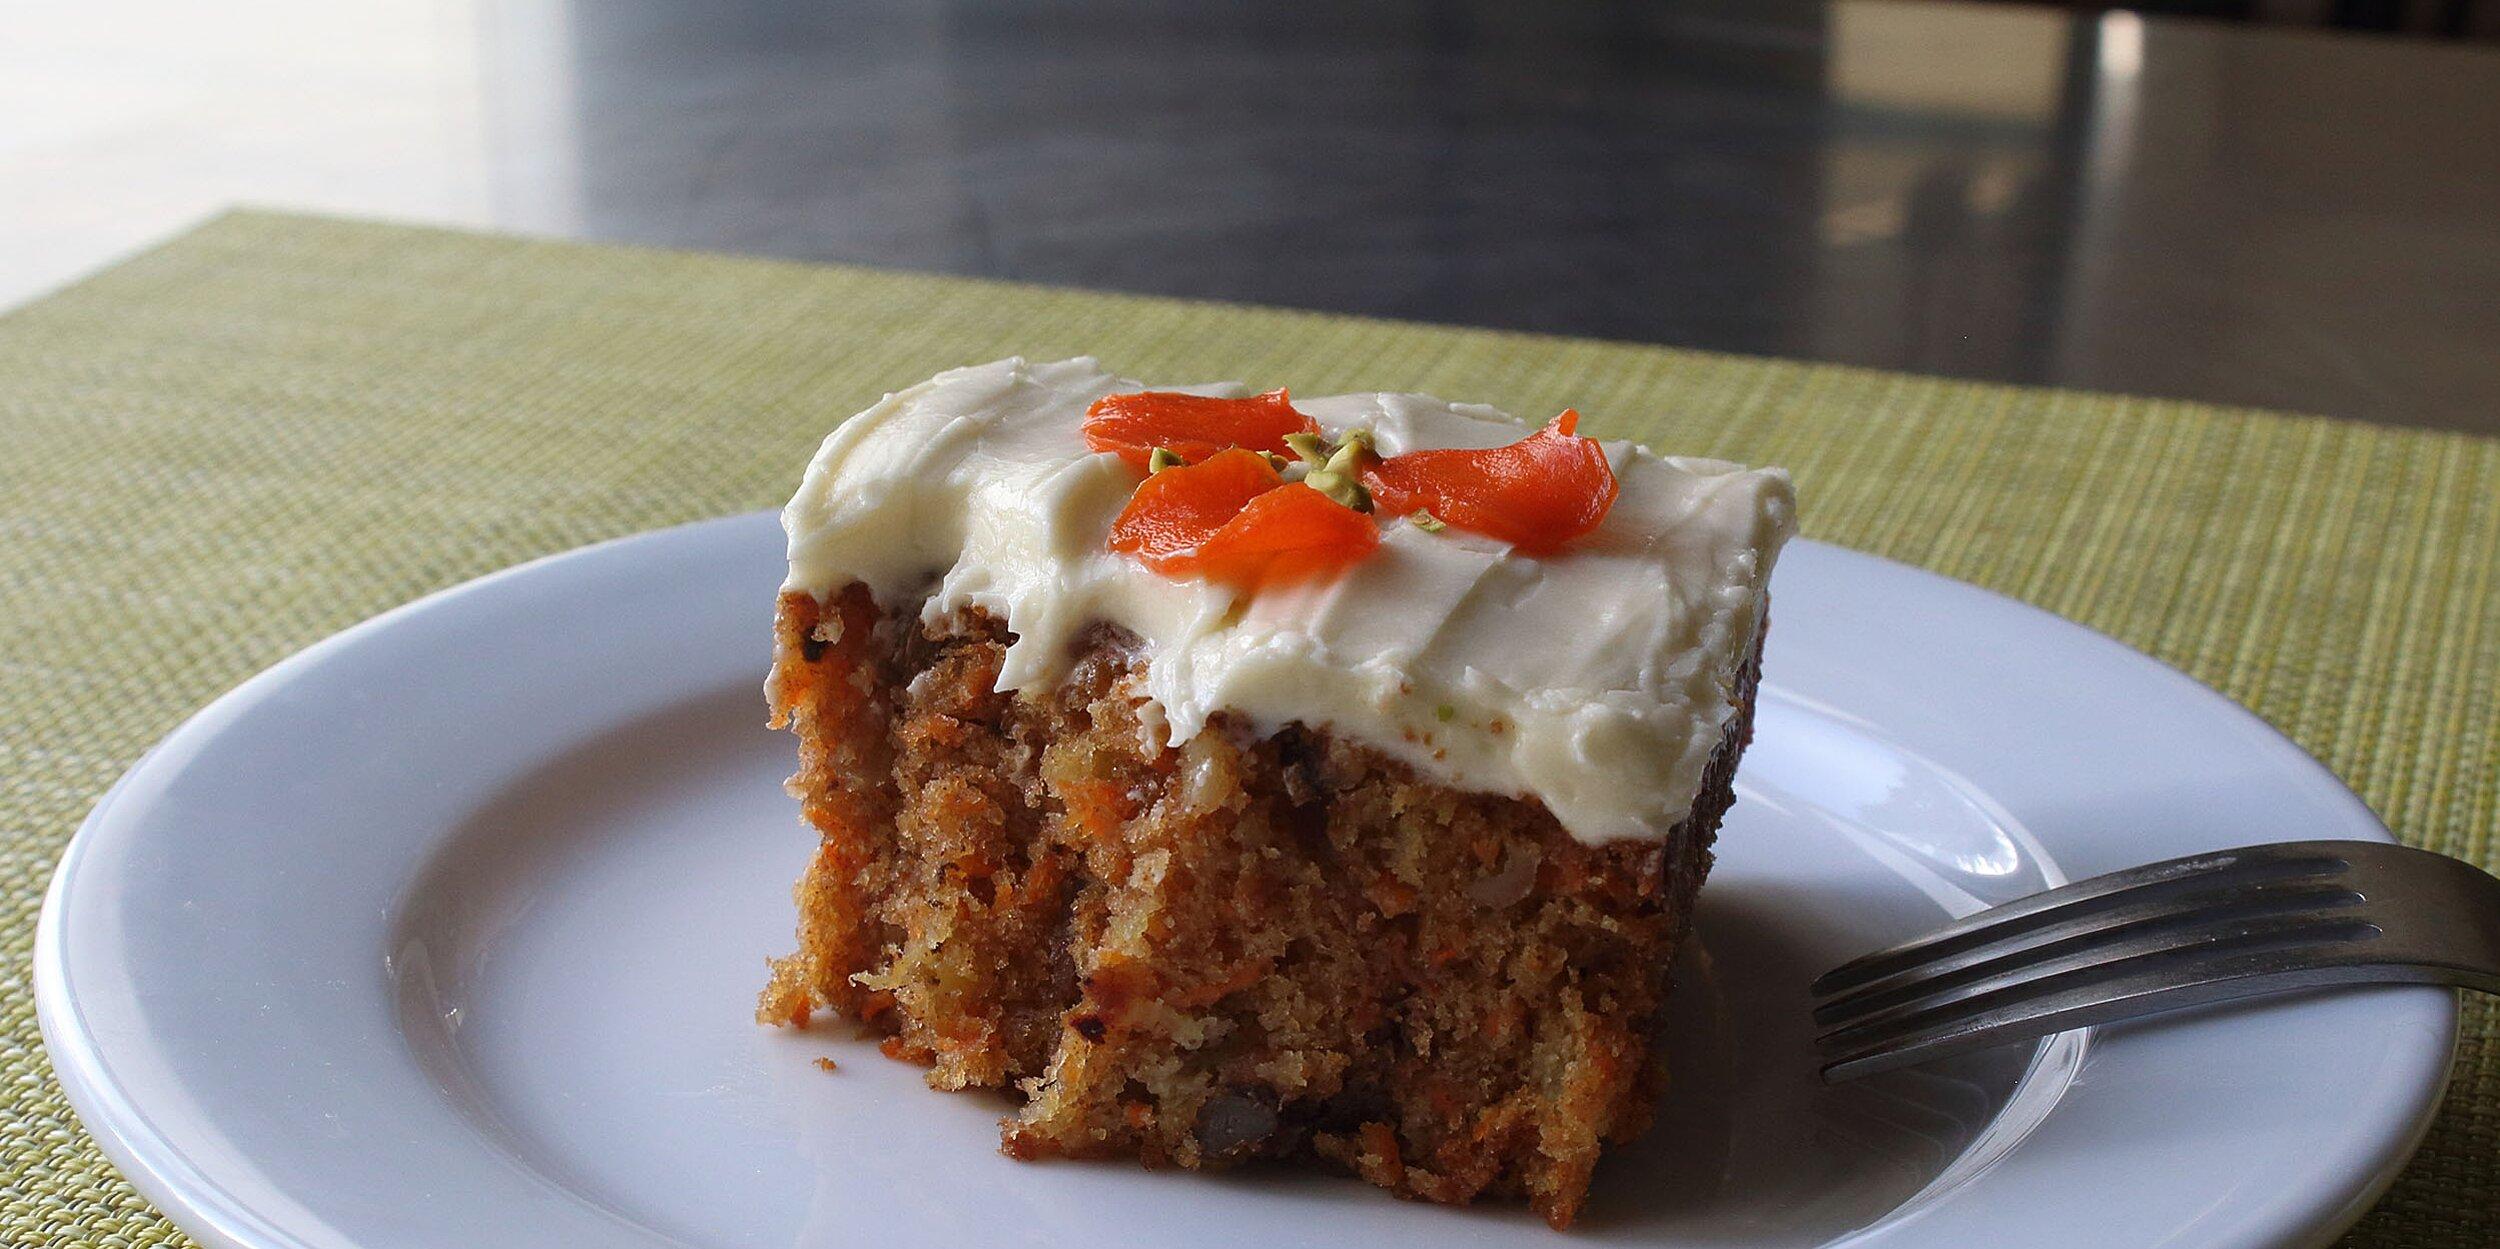 chef johns carrot cake